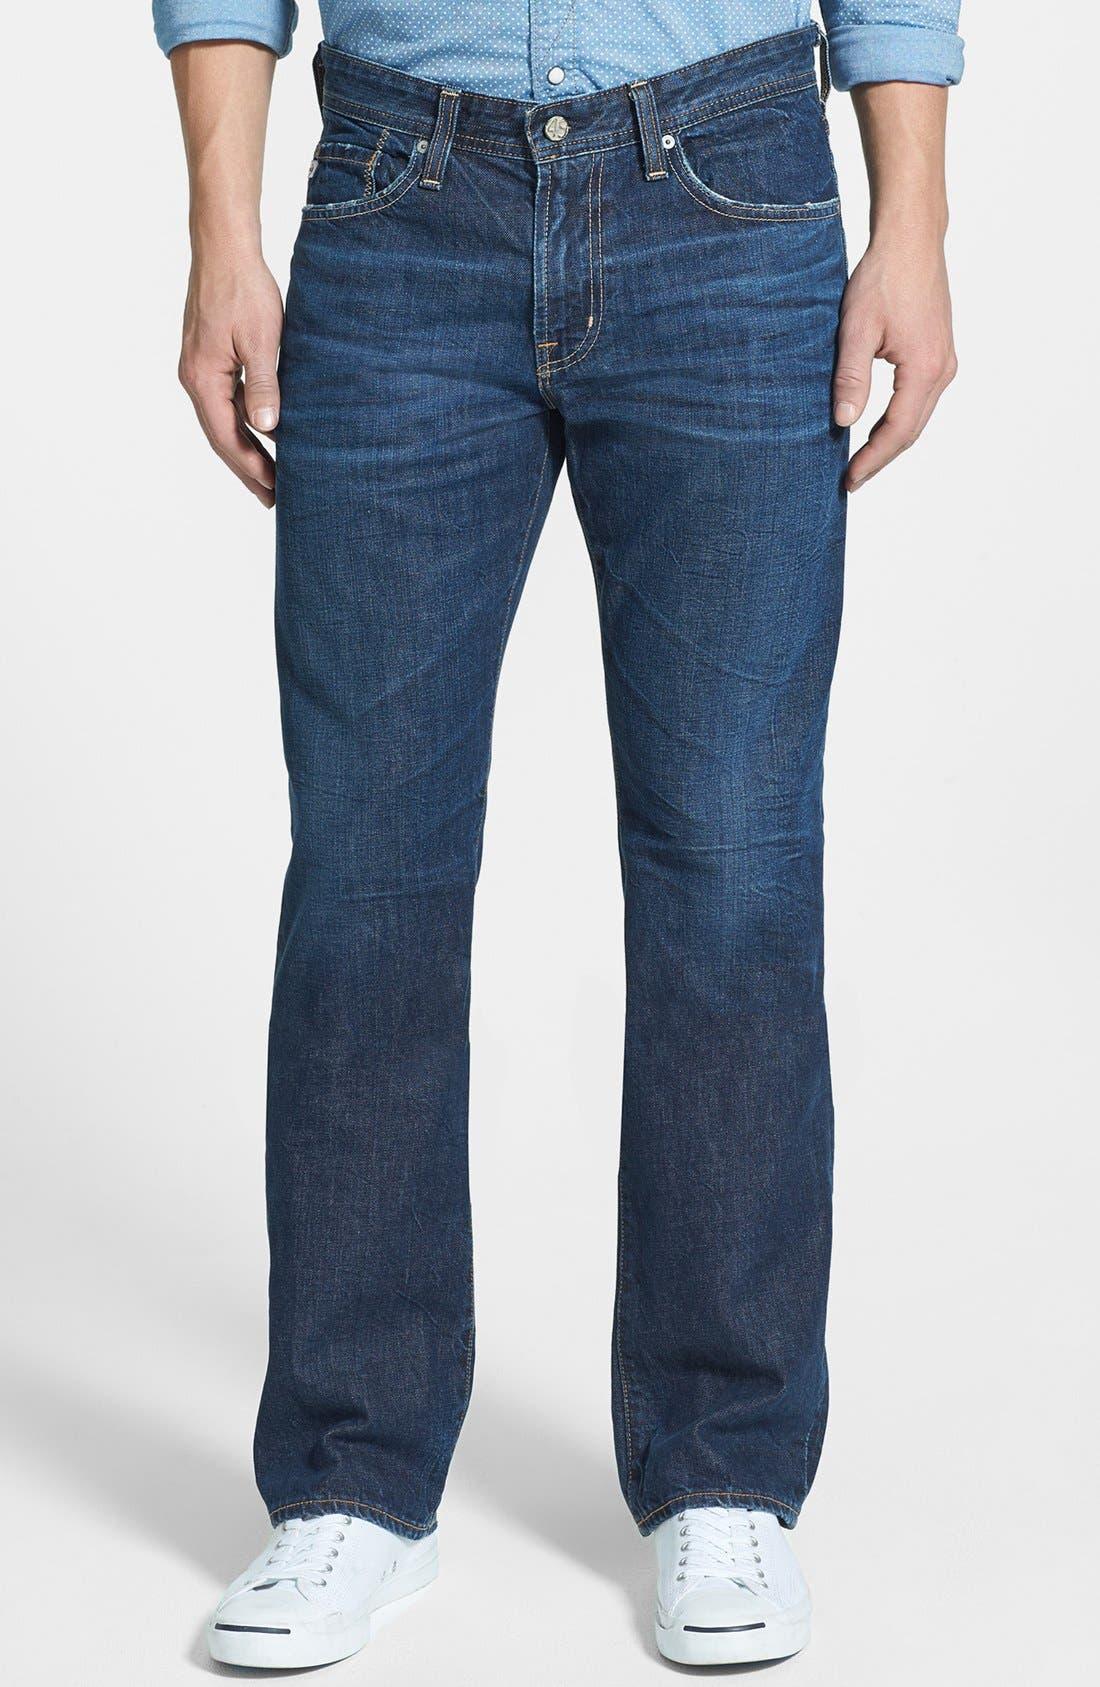 Alternate Image 1 Selected - AG 'Protégé' Straight Leg Jeans (Five Year Field)